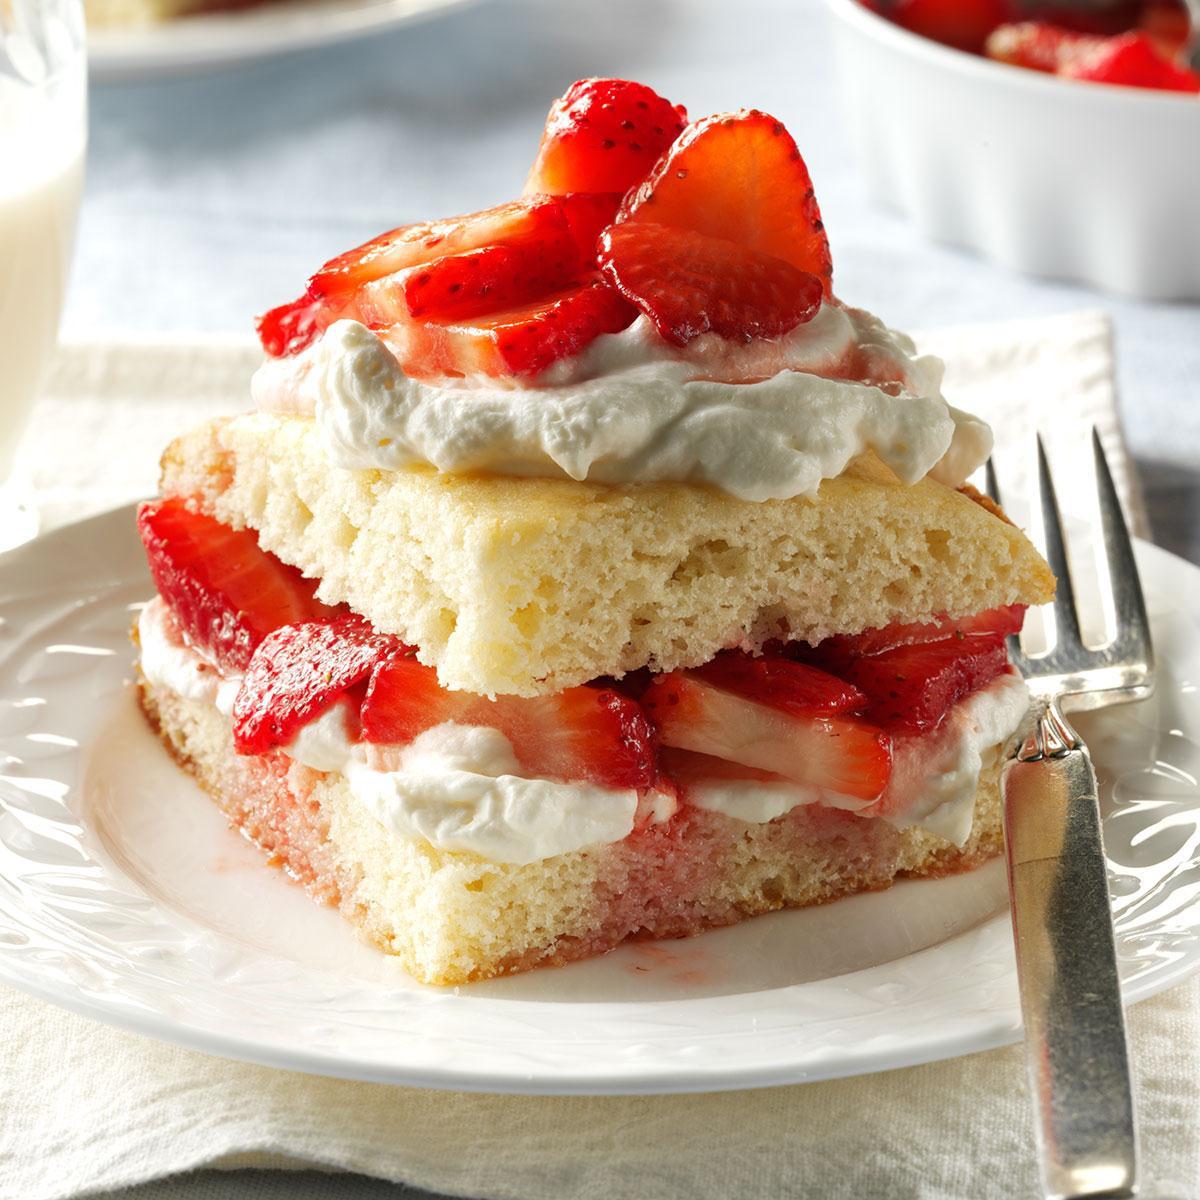 Strawberry Shortcake Biscuits Recipes  Strawberry Shortcake Recipe